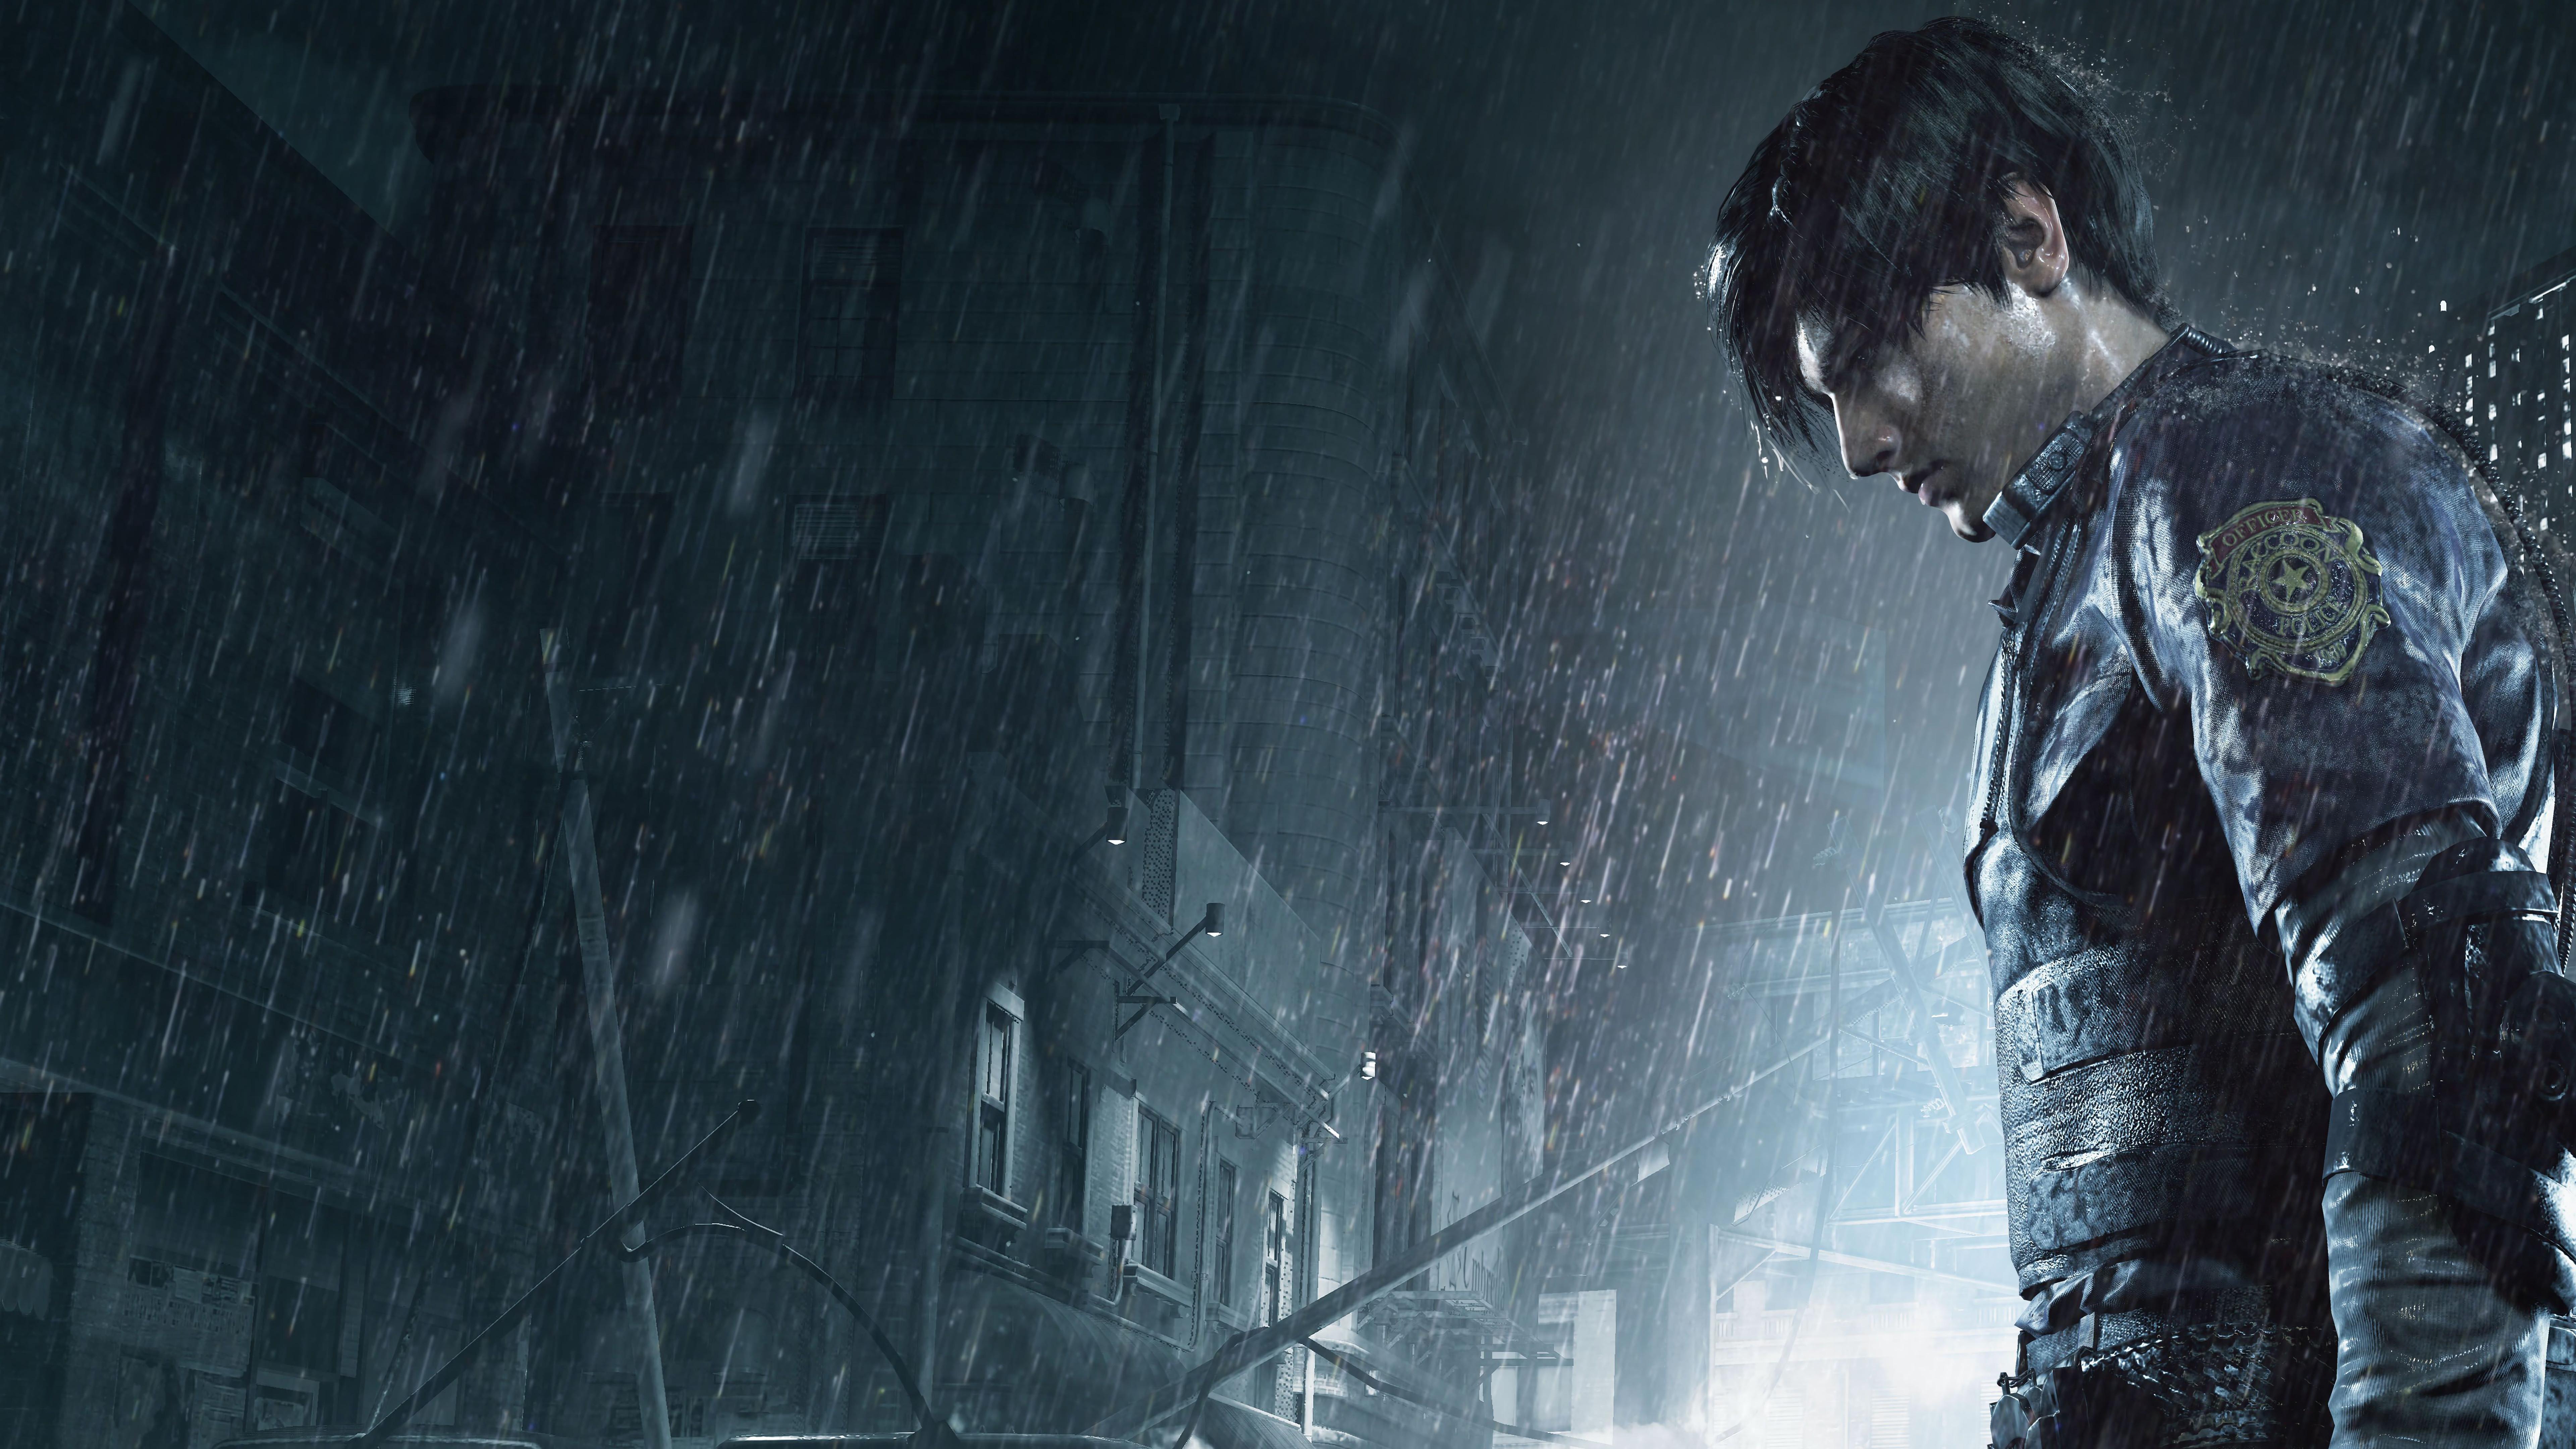 Leon Kennedy Resident Evil 2 Hd Games 4k Wallpapers